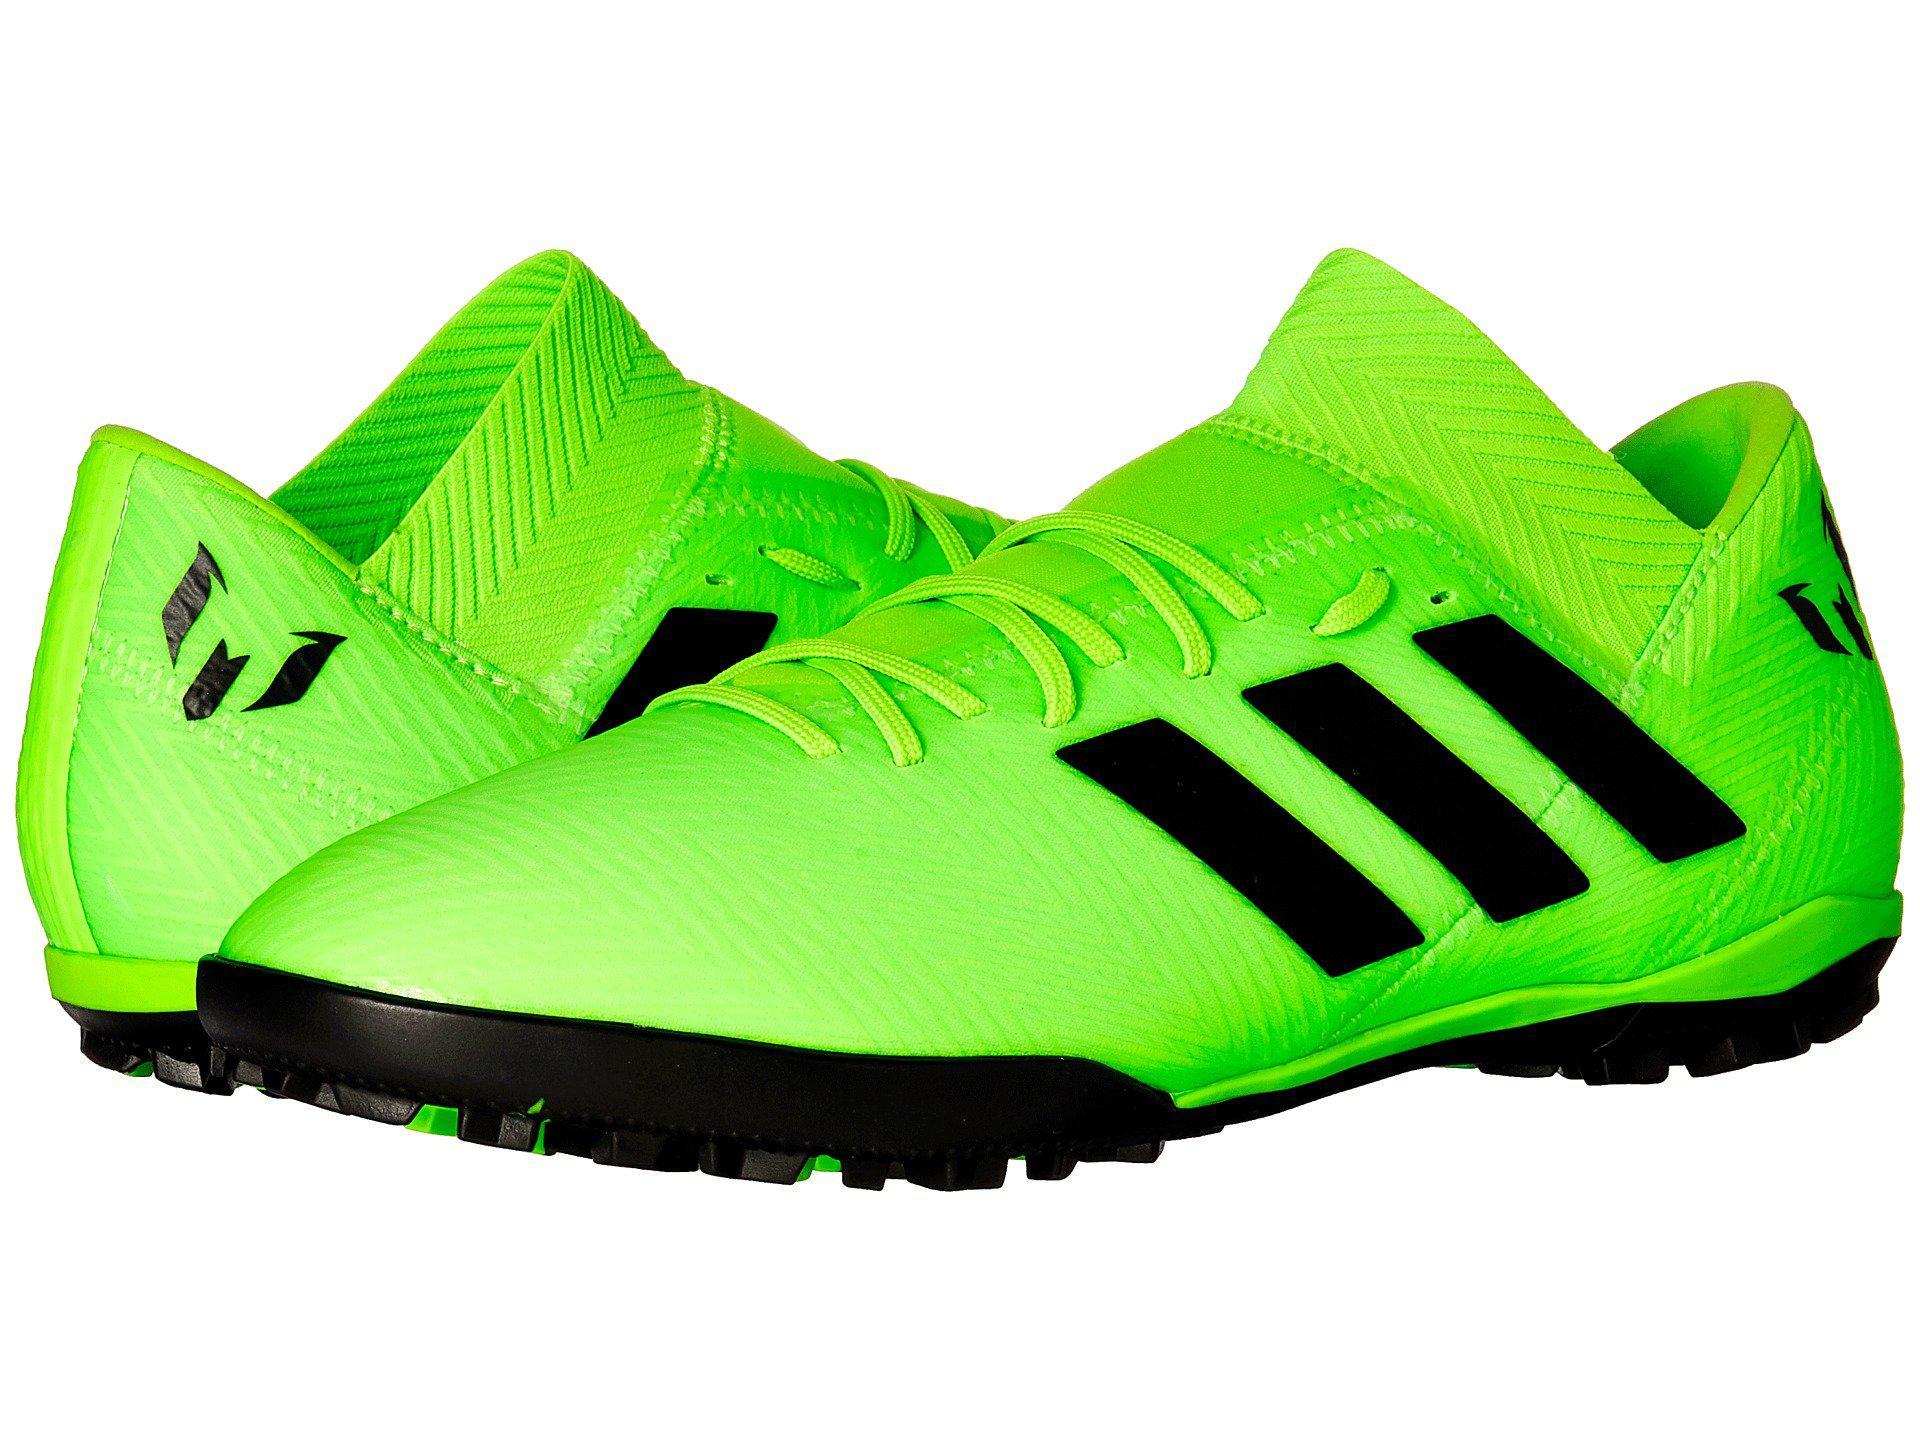 8a19e034965 Adidas - Green Nemeziz Messi Tango 18.3 Tf for Men - Lyst. View fullscreen